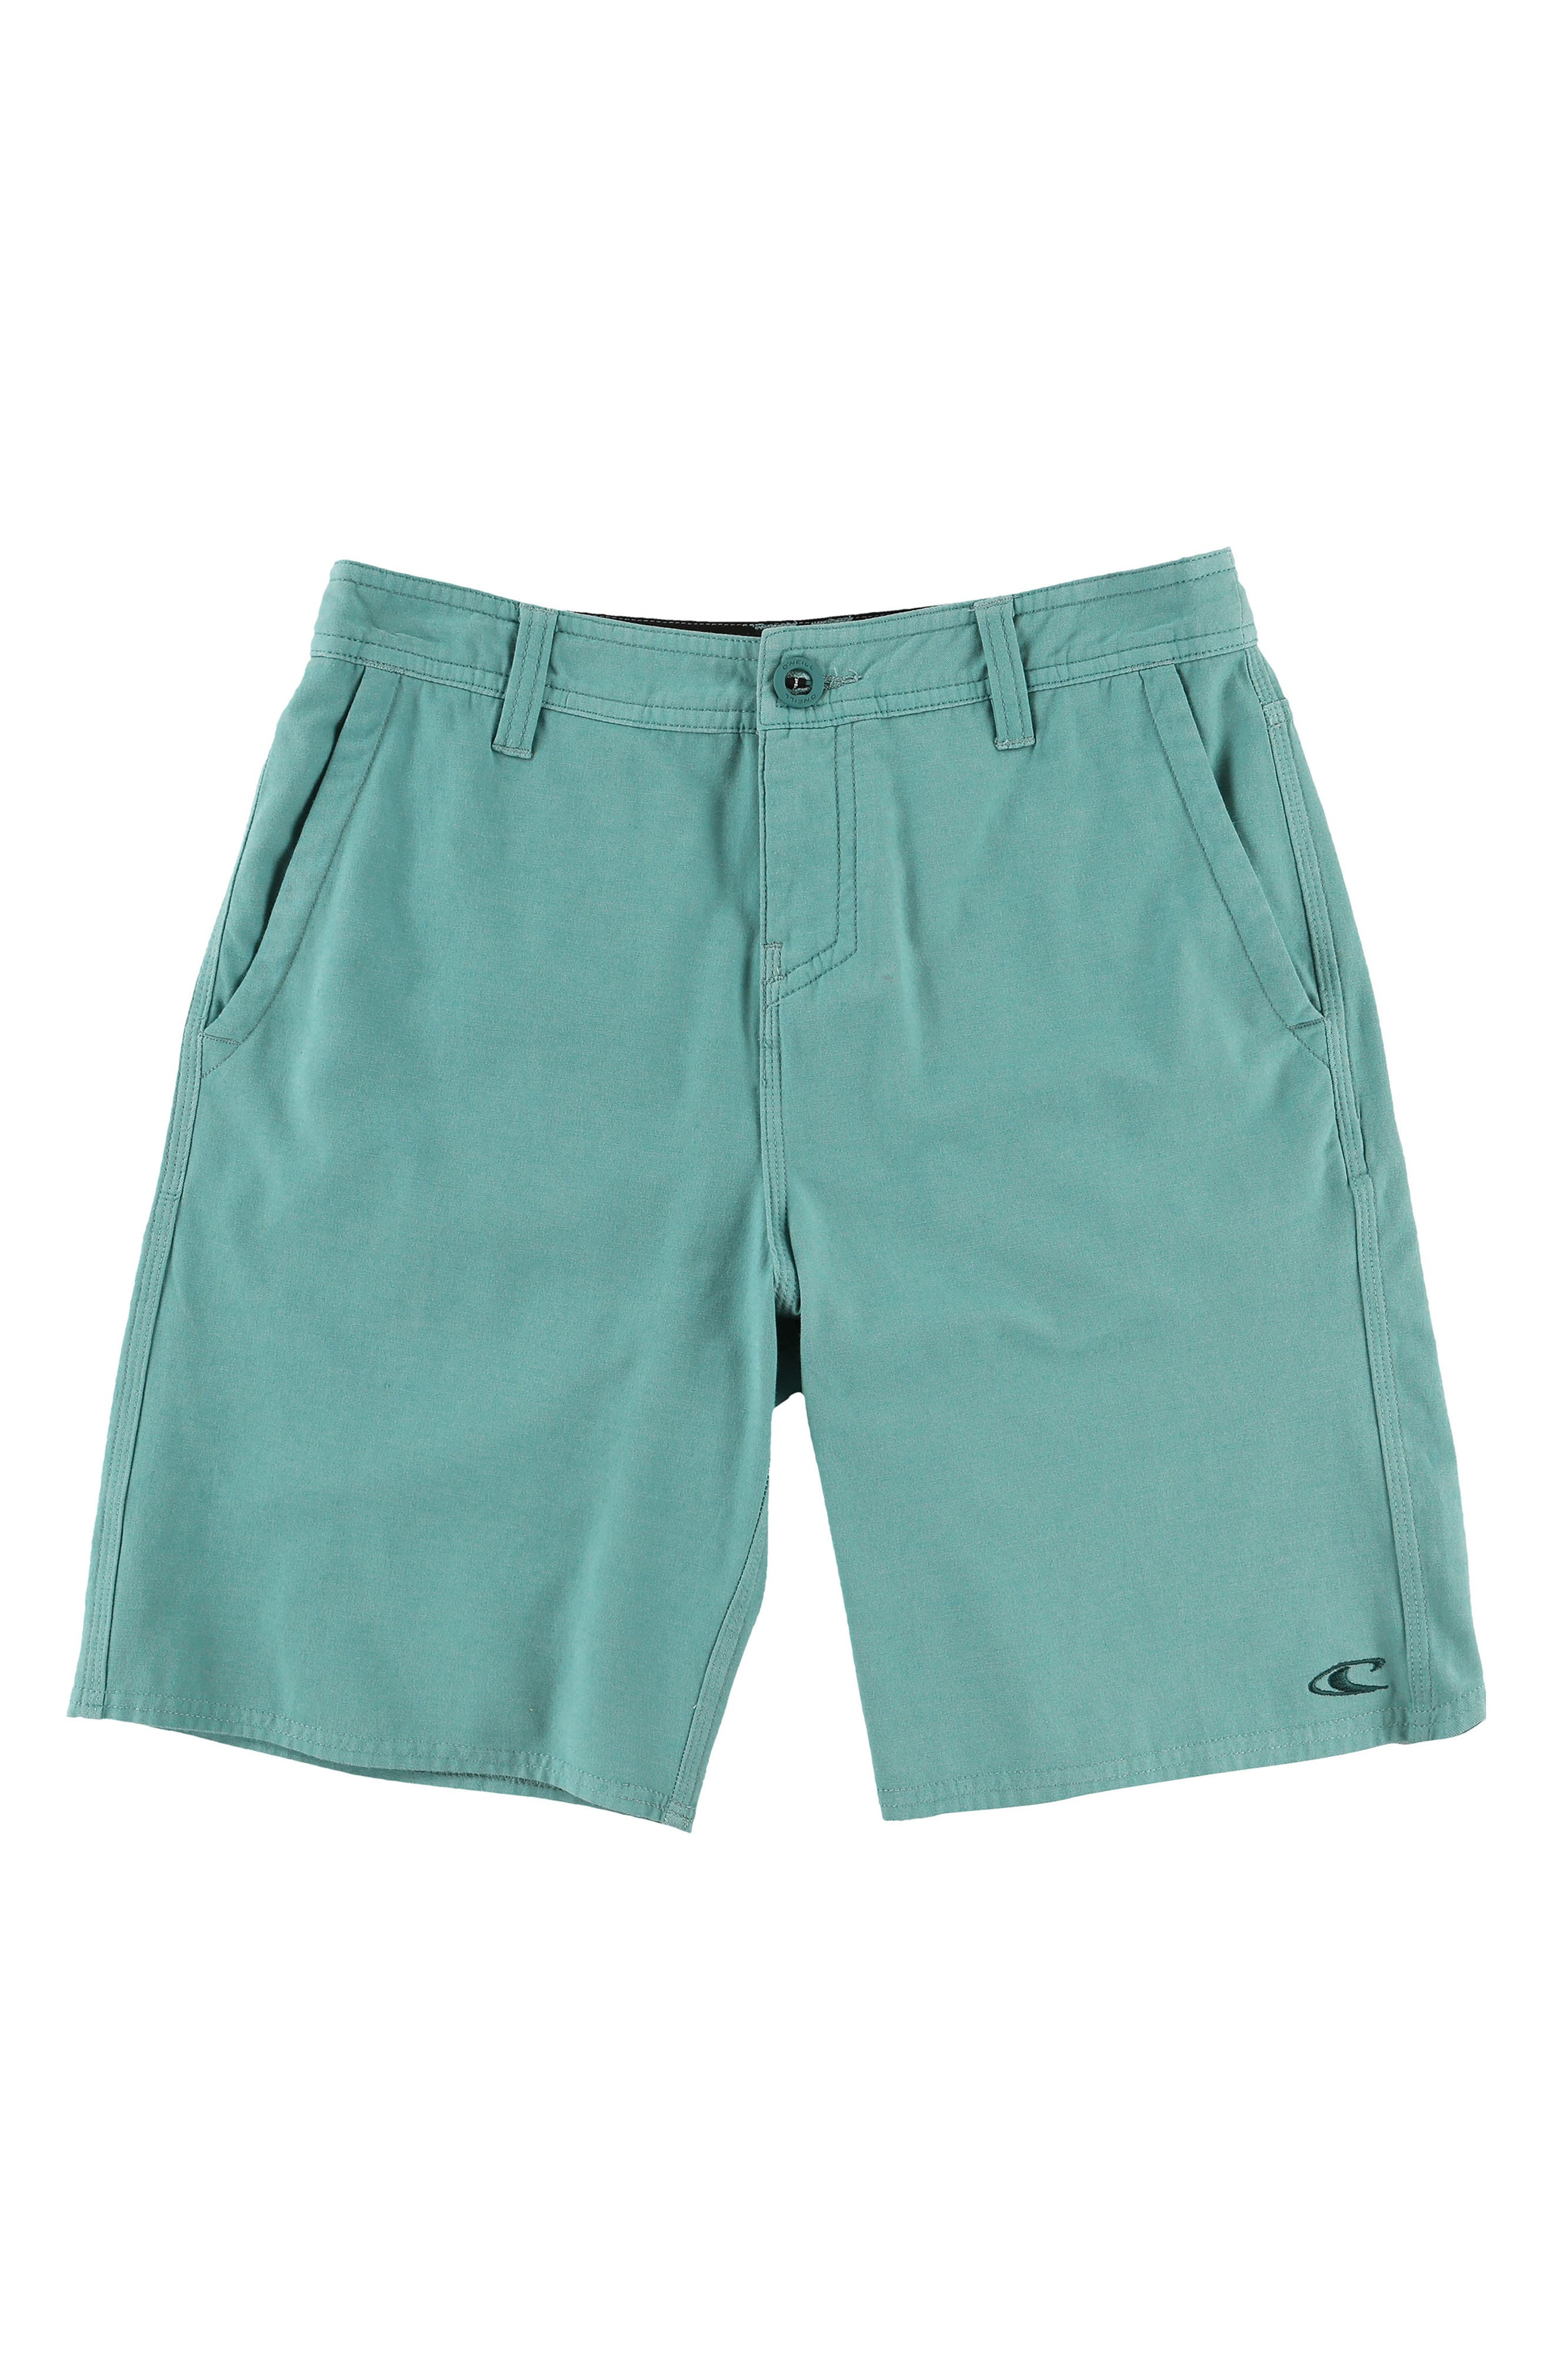 Main Image - O'Neill Locked Overdye Hybrid Shorts (Big Boys)